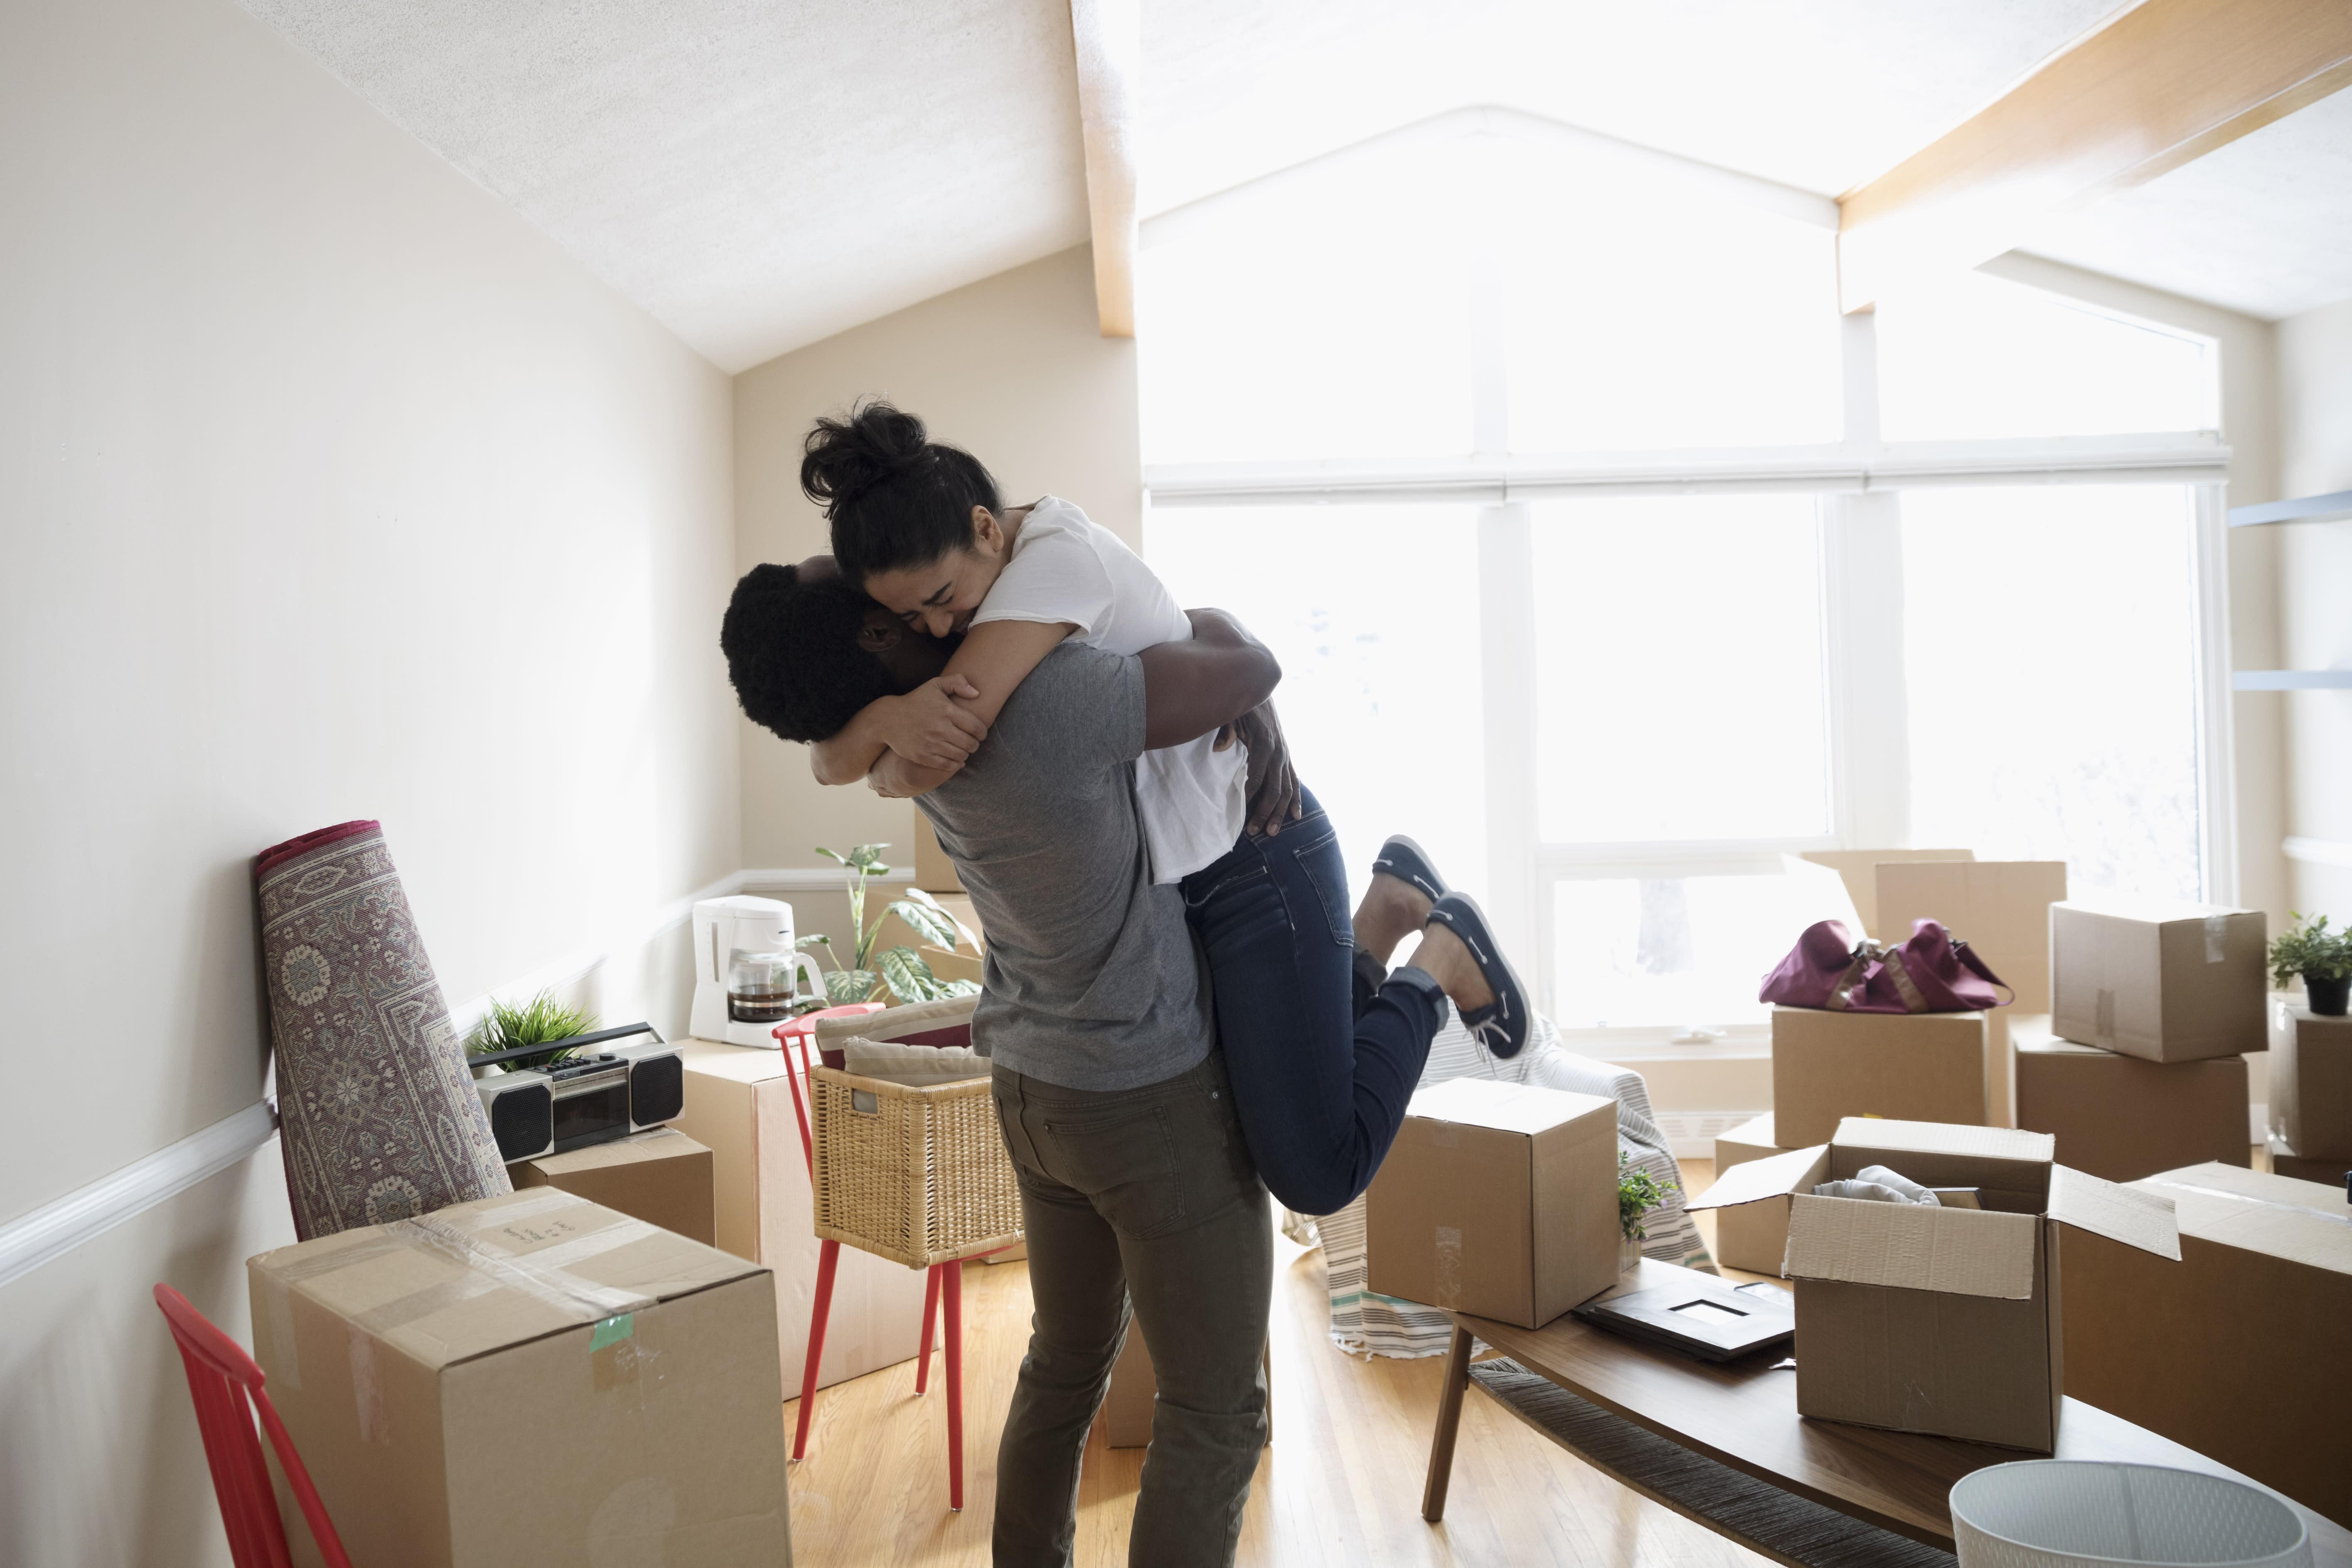 Housing market optimism won't necessarily boost home sales